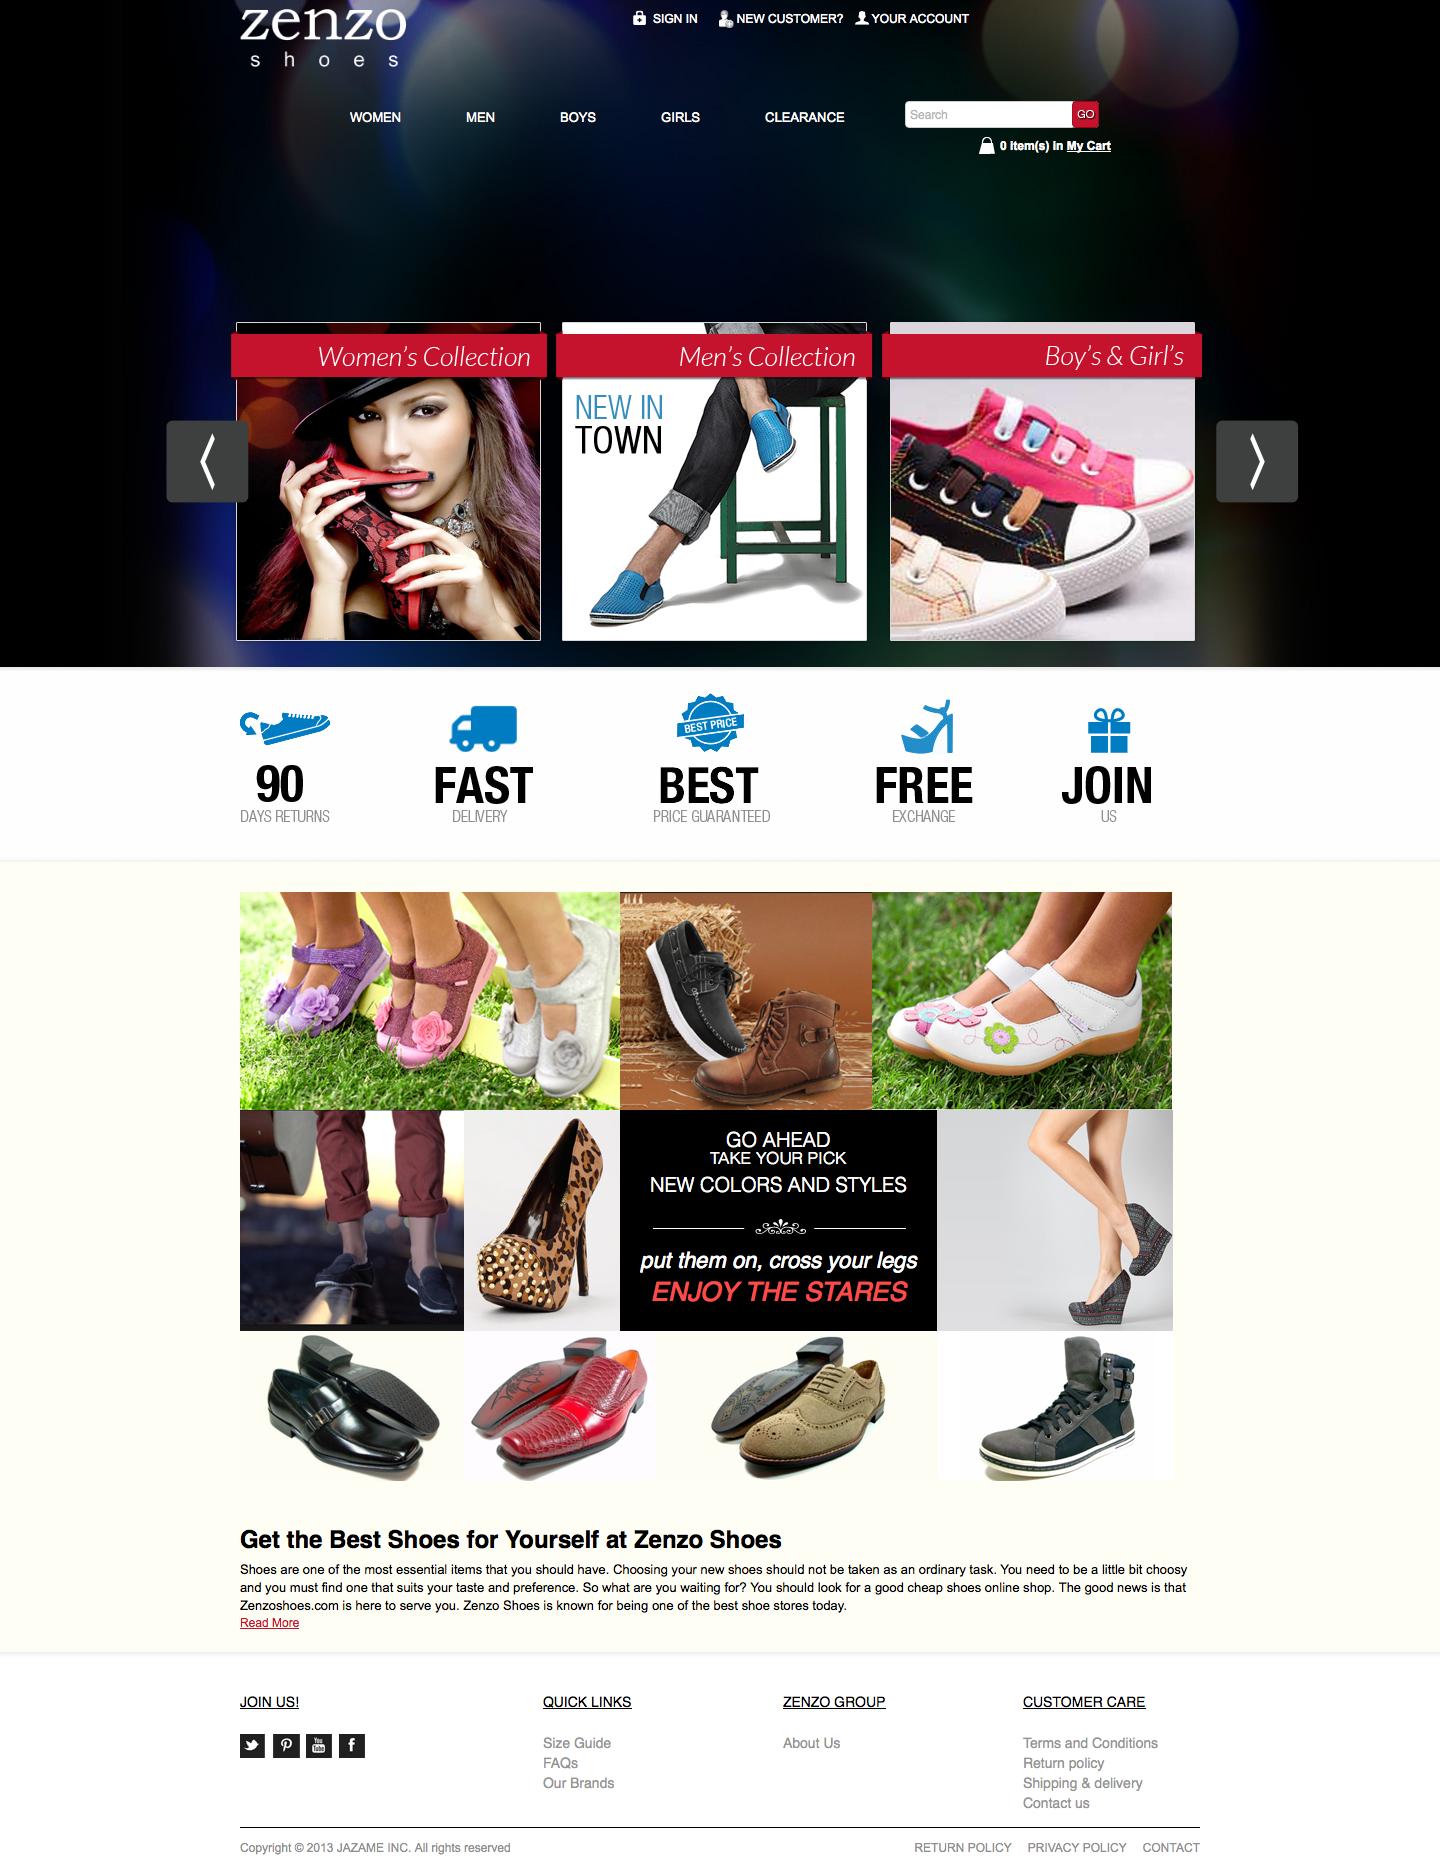 Zenzo Shoes